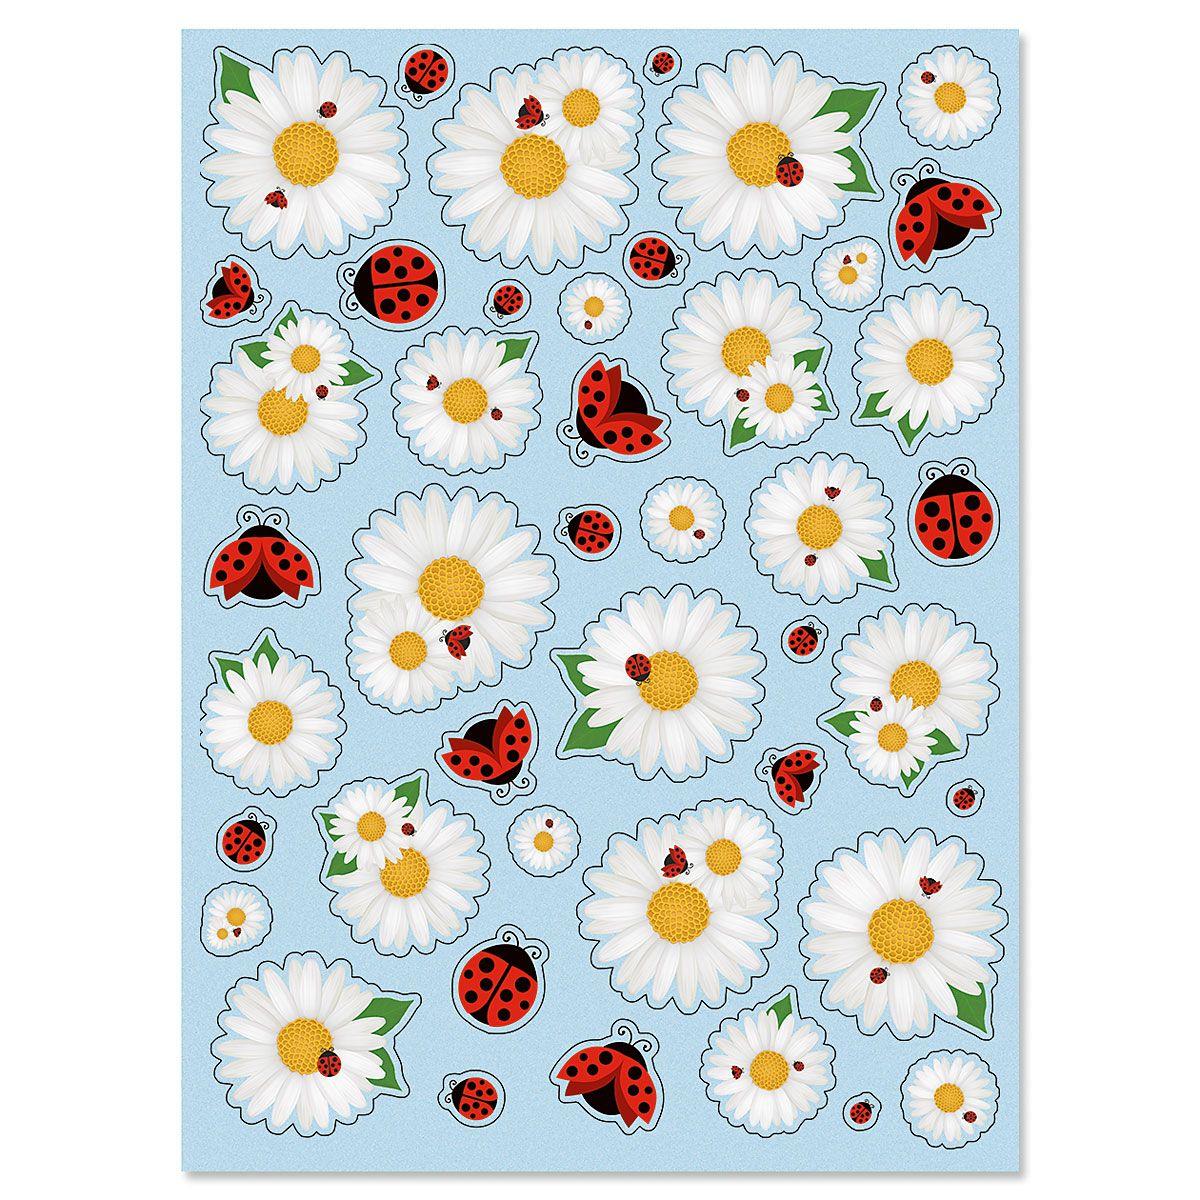 Daisy & Ladybug Stickers